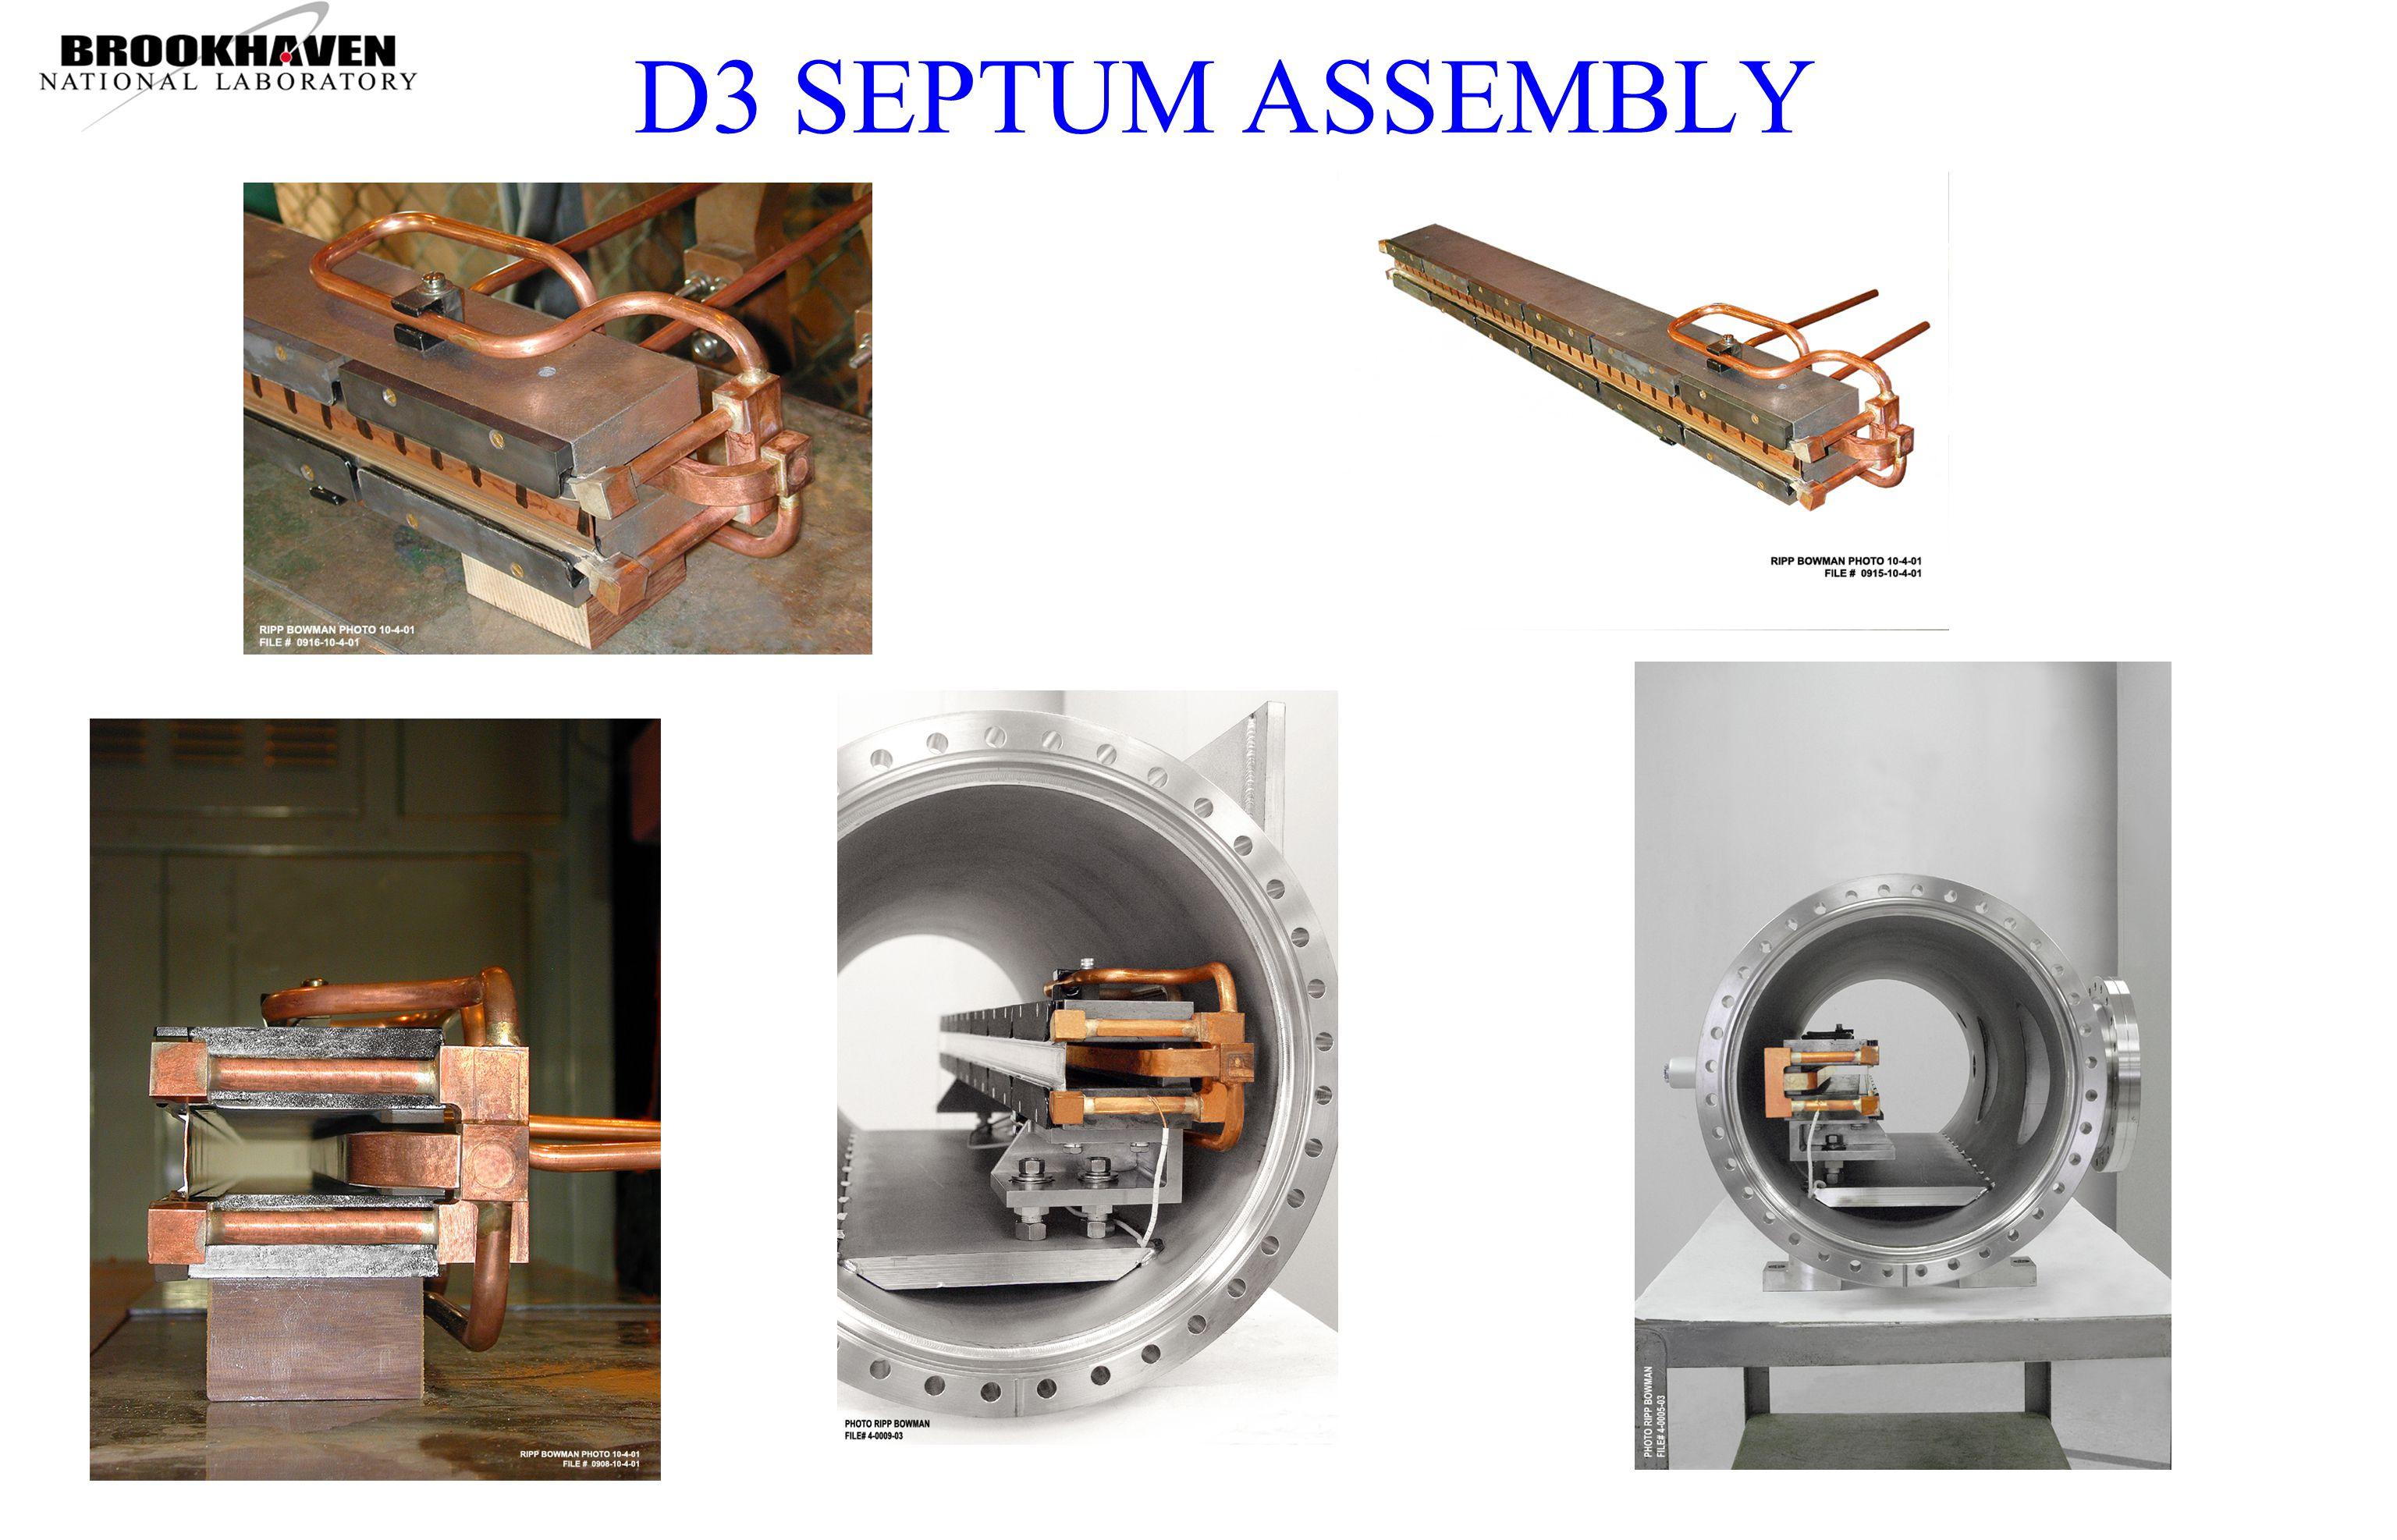 D3 SEPTUM ASSEMBLY